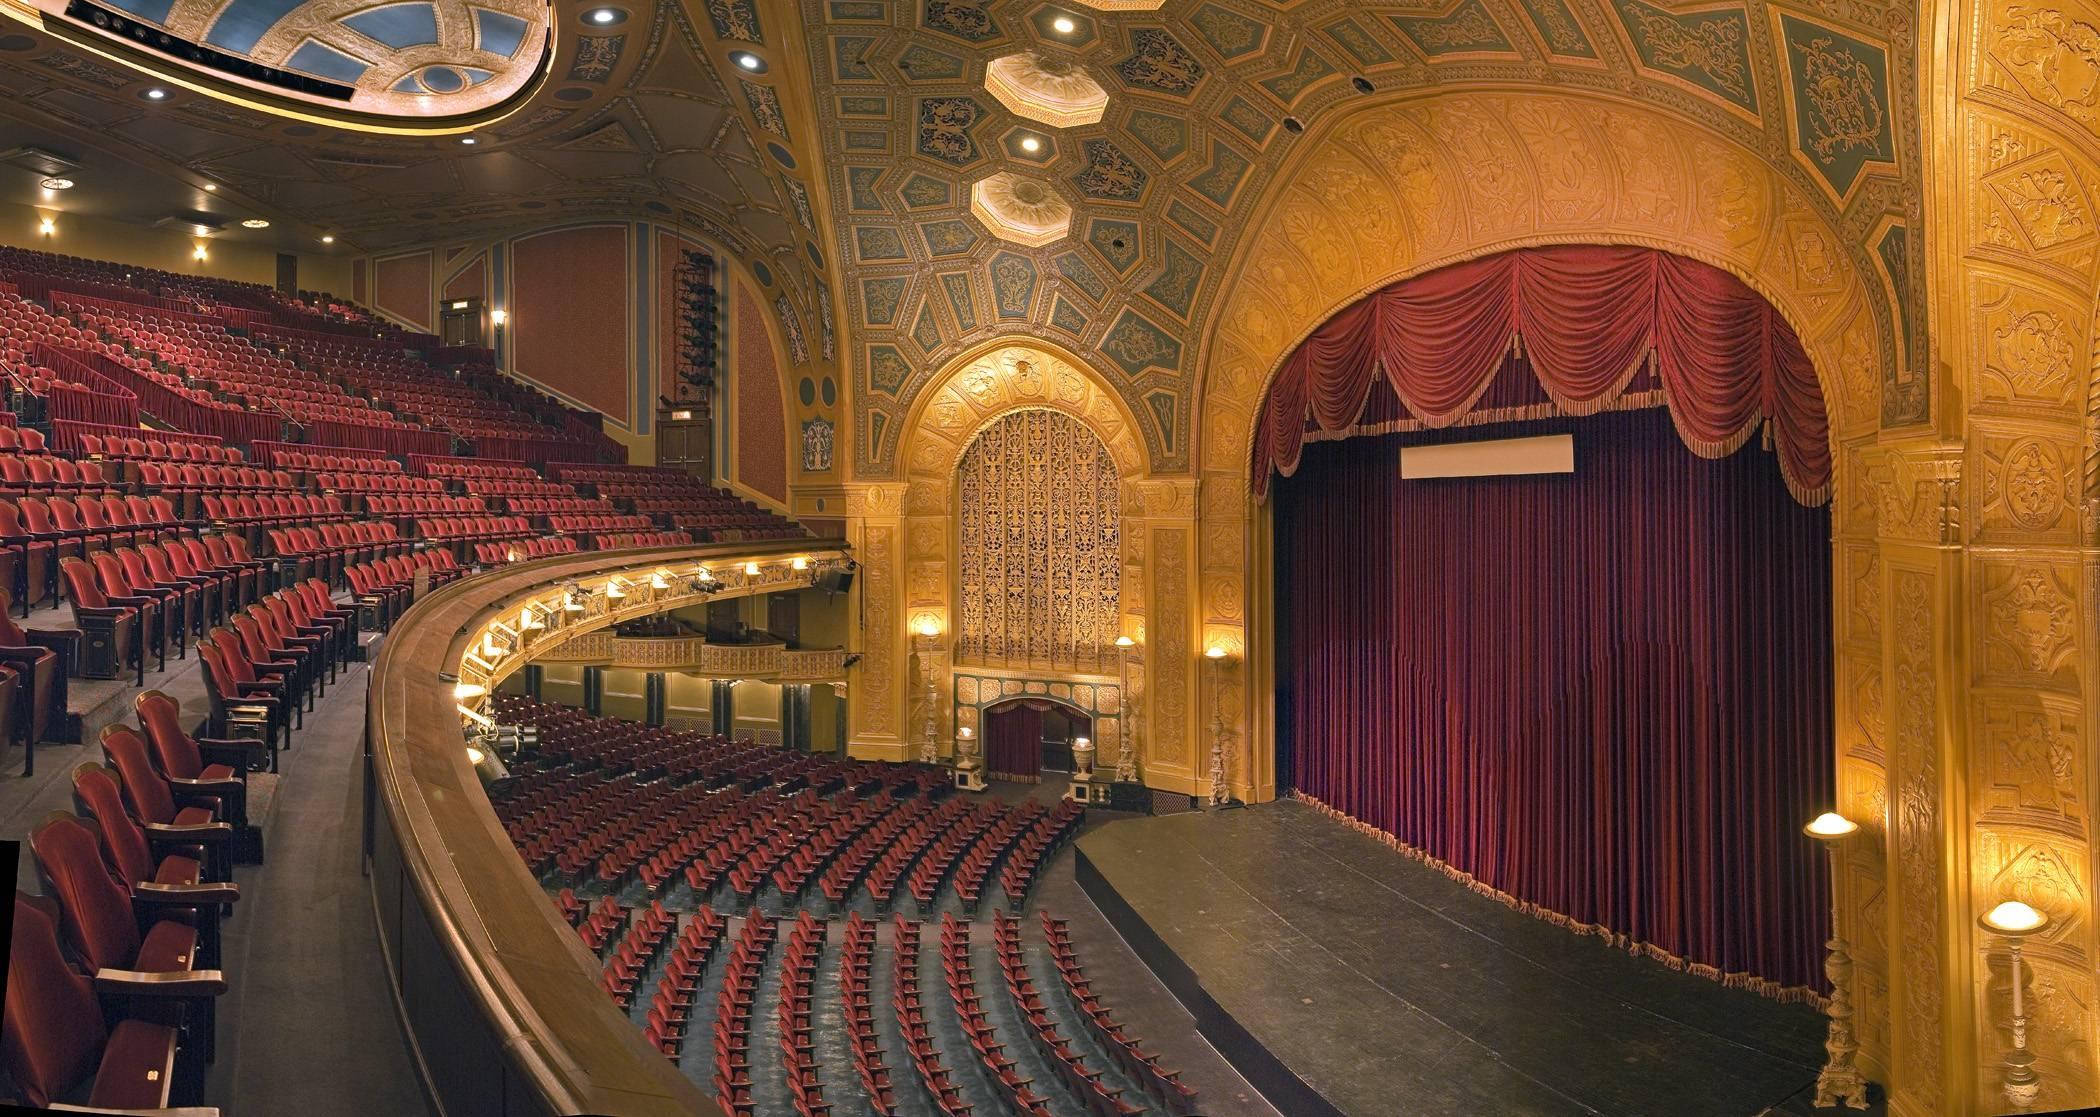 Detroit Opera House Visual Tour